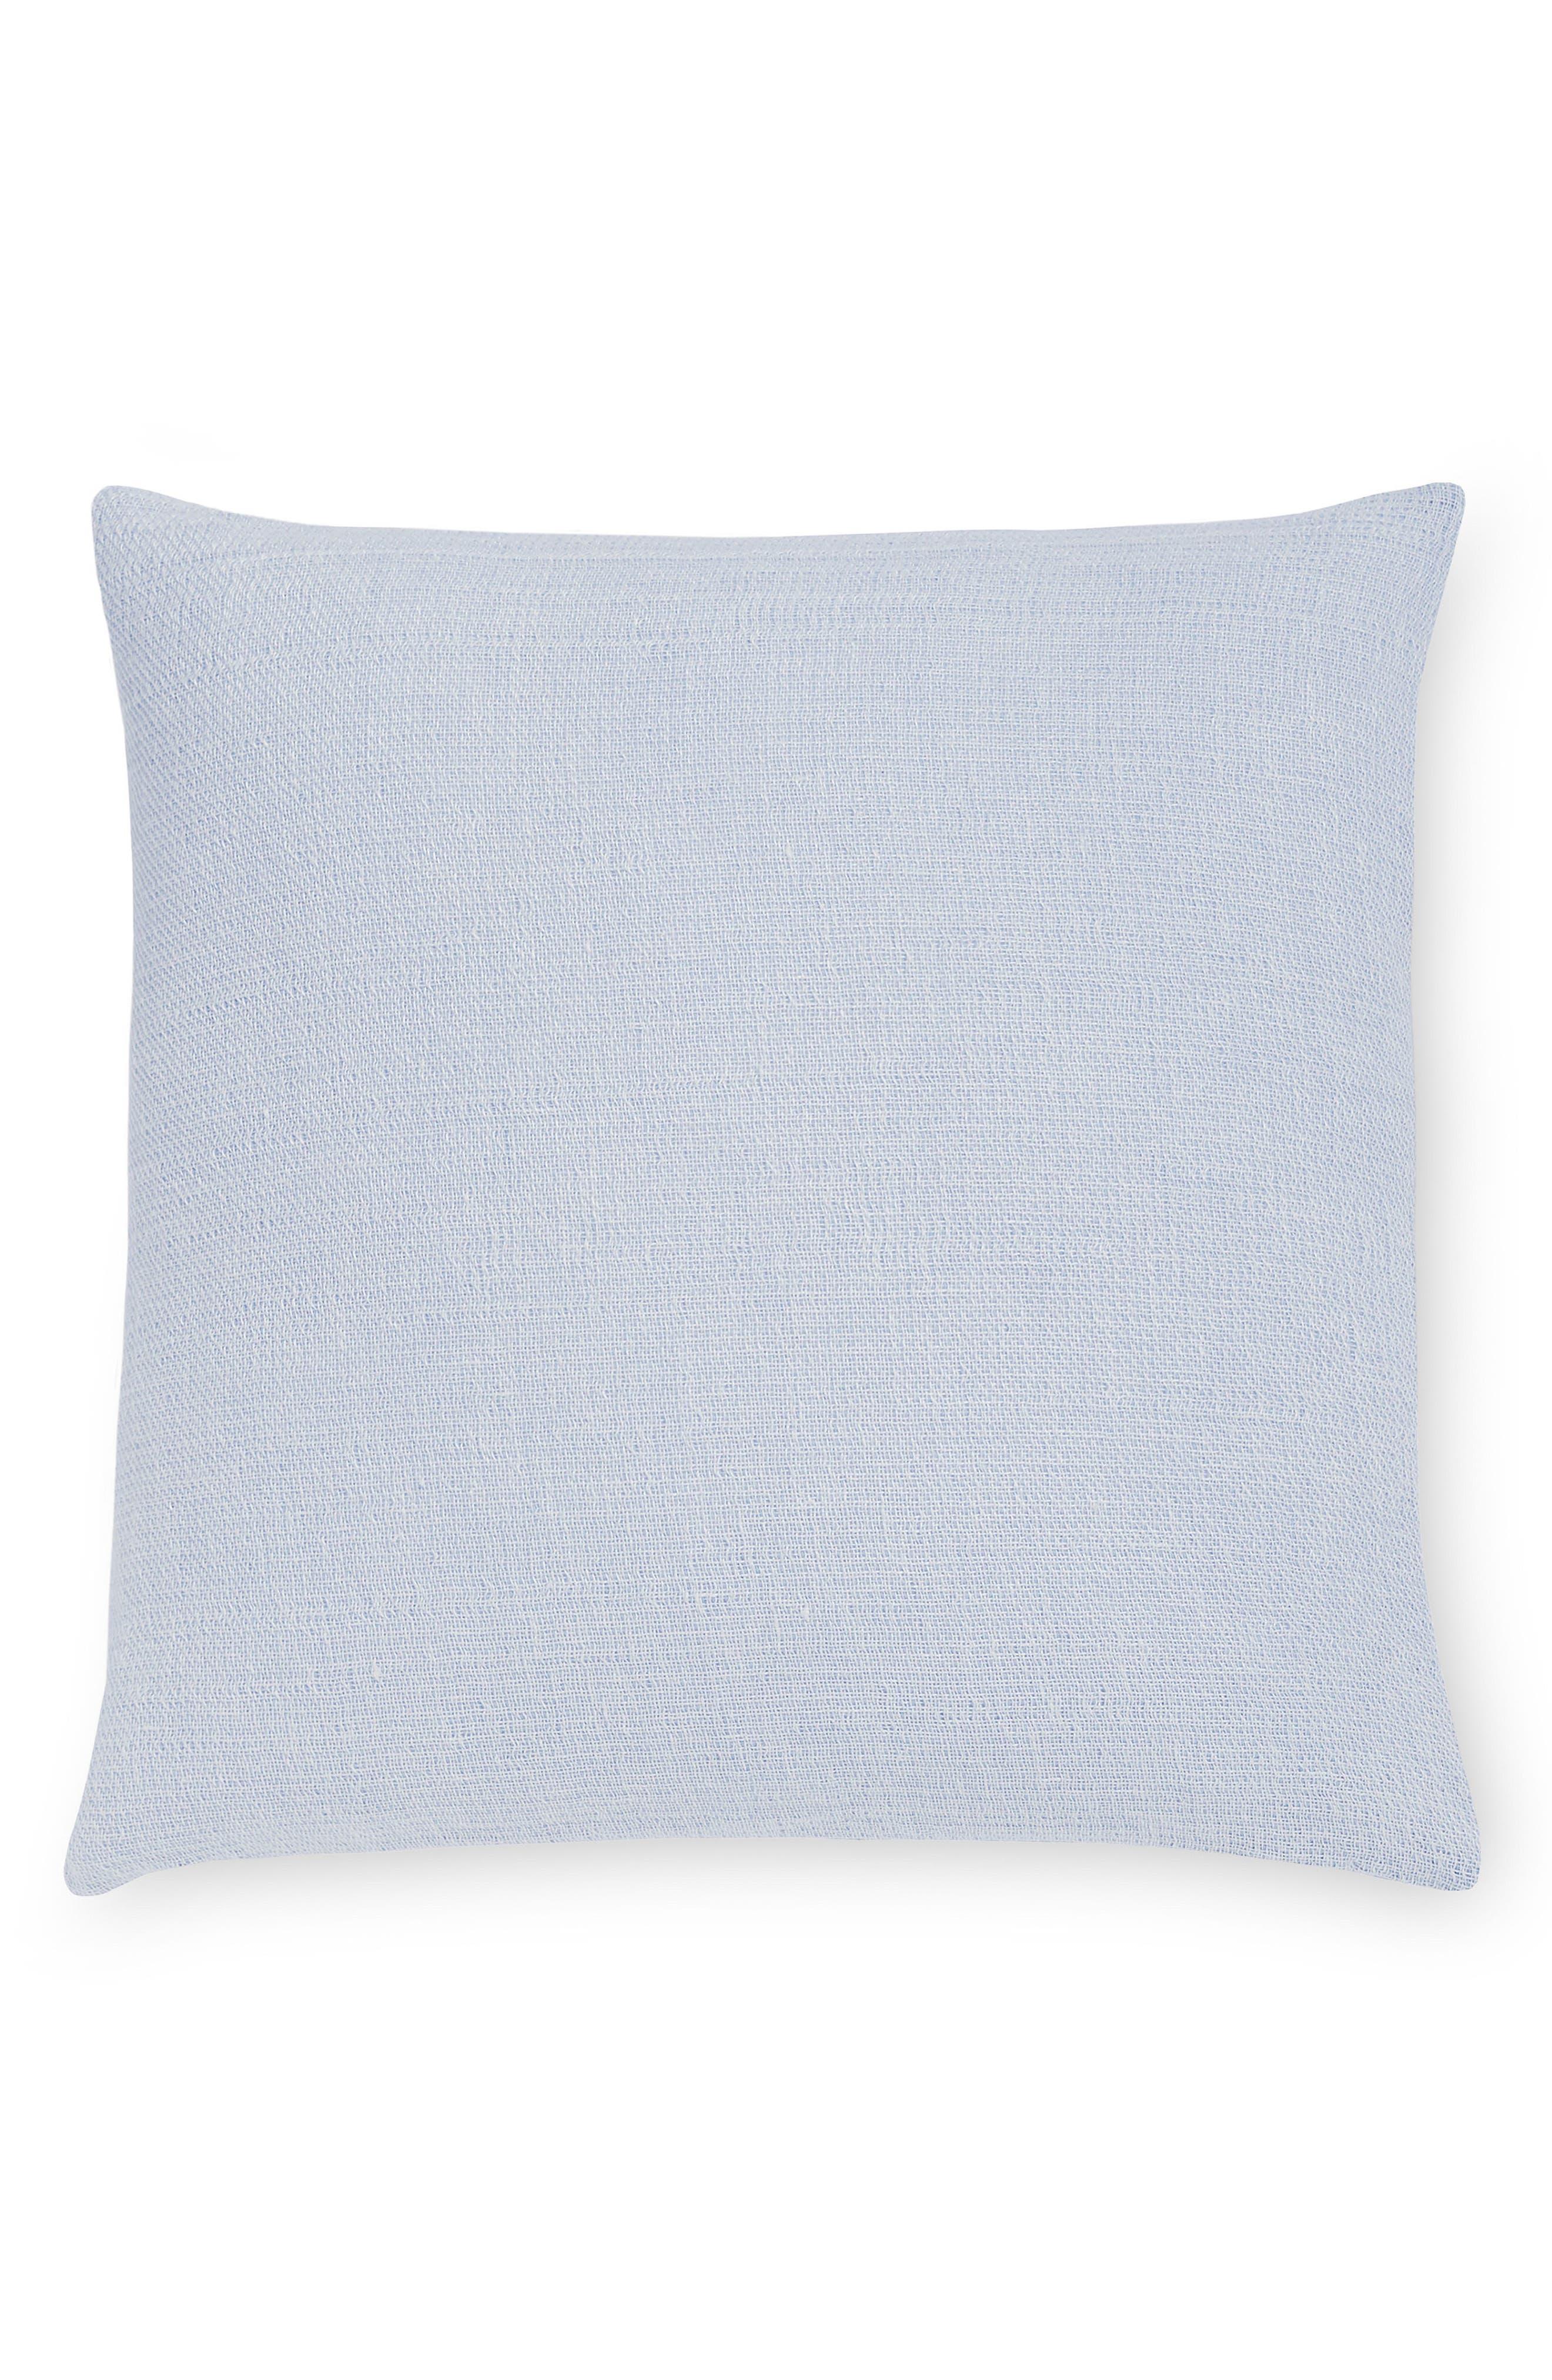 Perlo Accent Pillow,                         Main,                         color, Ocean